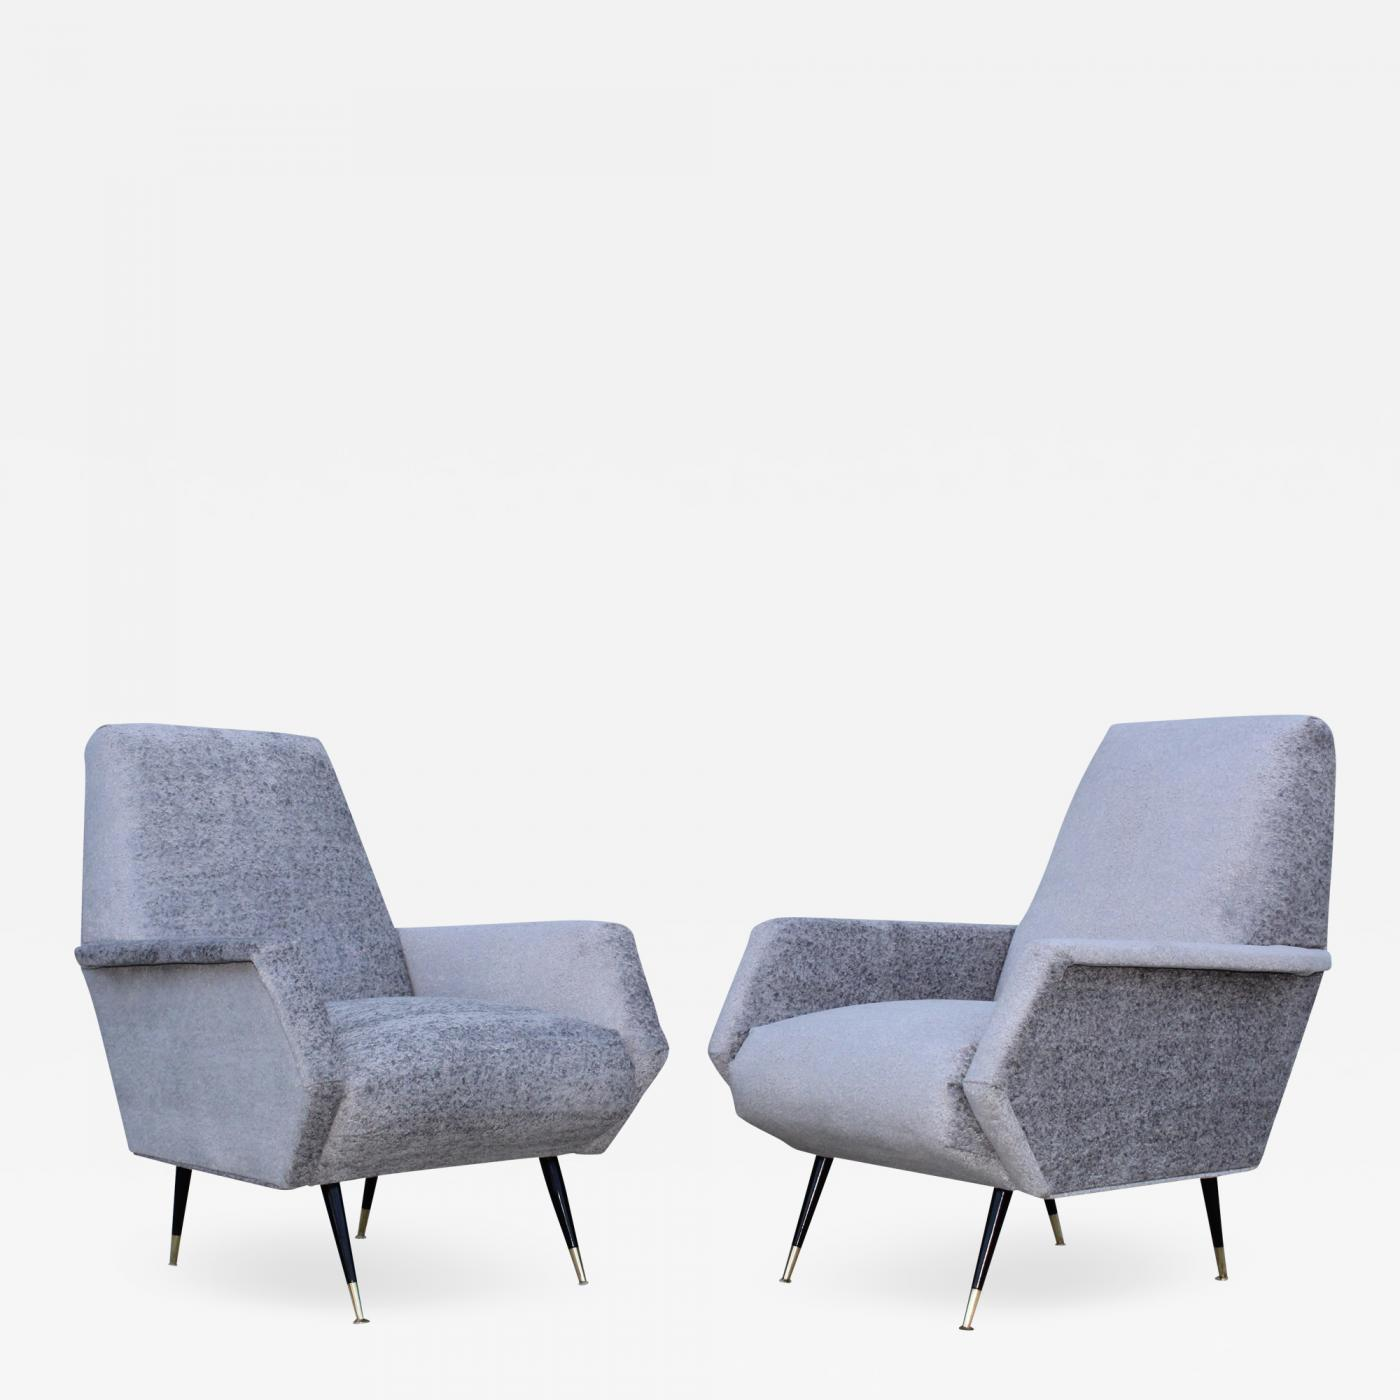 Listings / Furniture / Seating / Club Chairs · 1950s Italian Mid Century Modern  Lounge Chairs